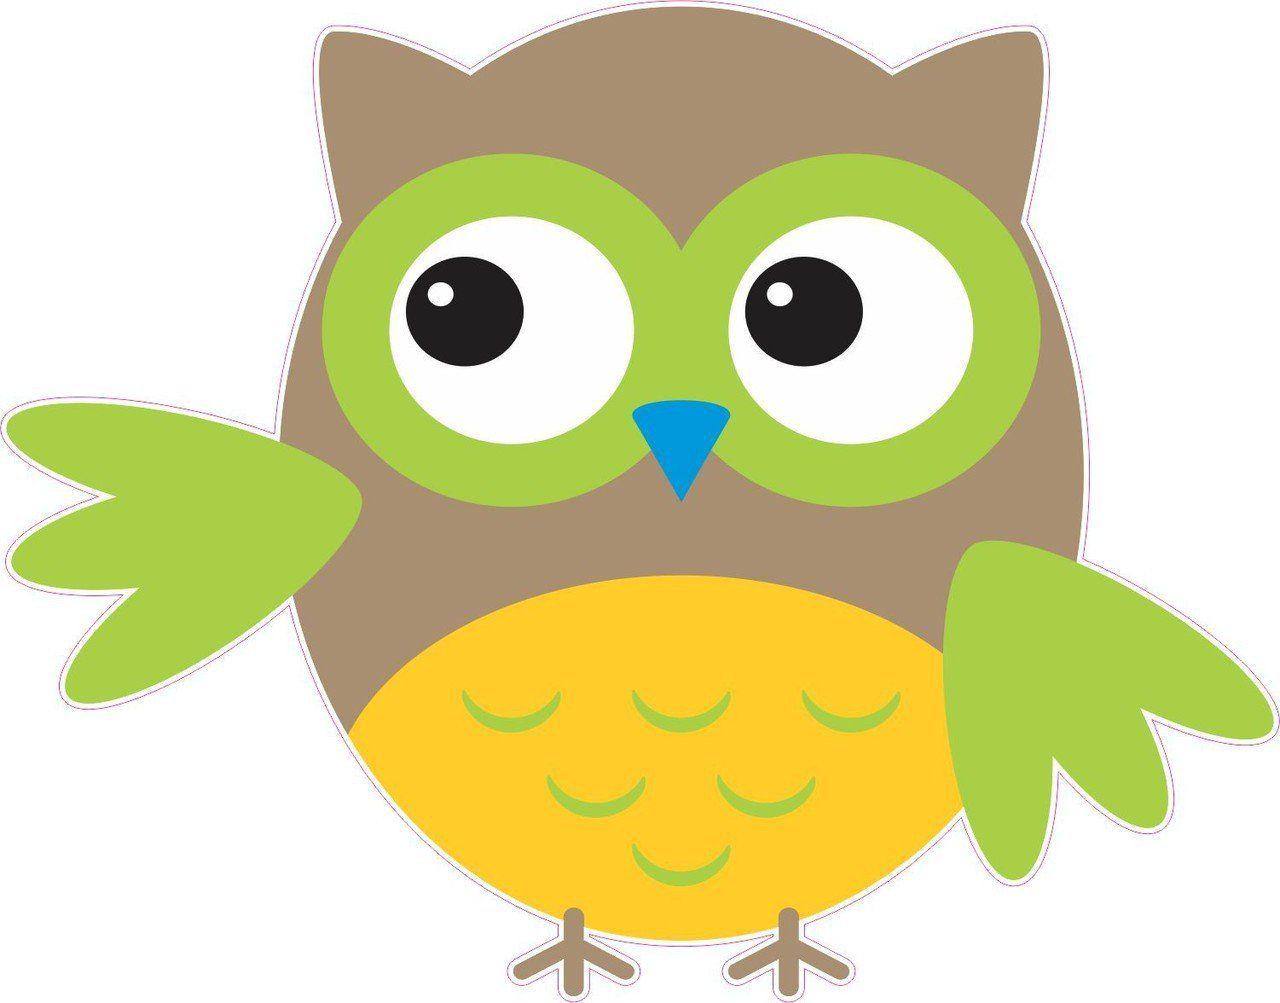 Owl Colorful Owls stickers Window Truck Car Vinyl Bumper Sticker Decal 5